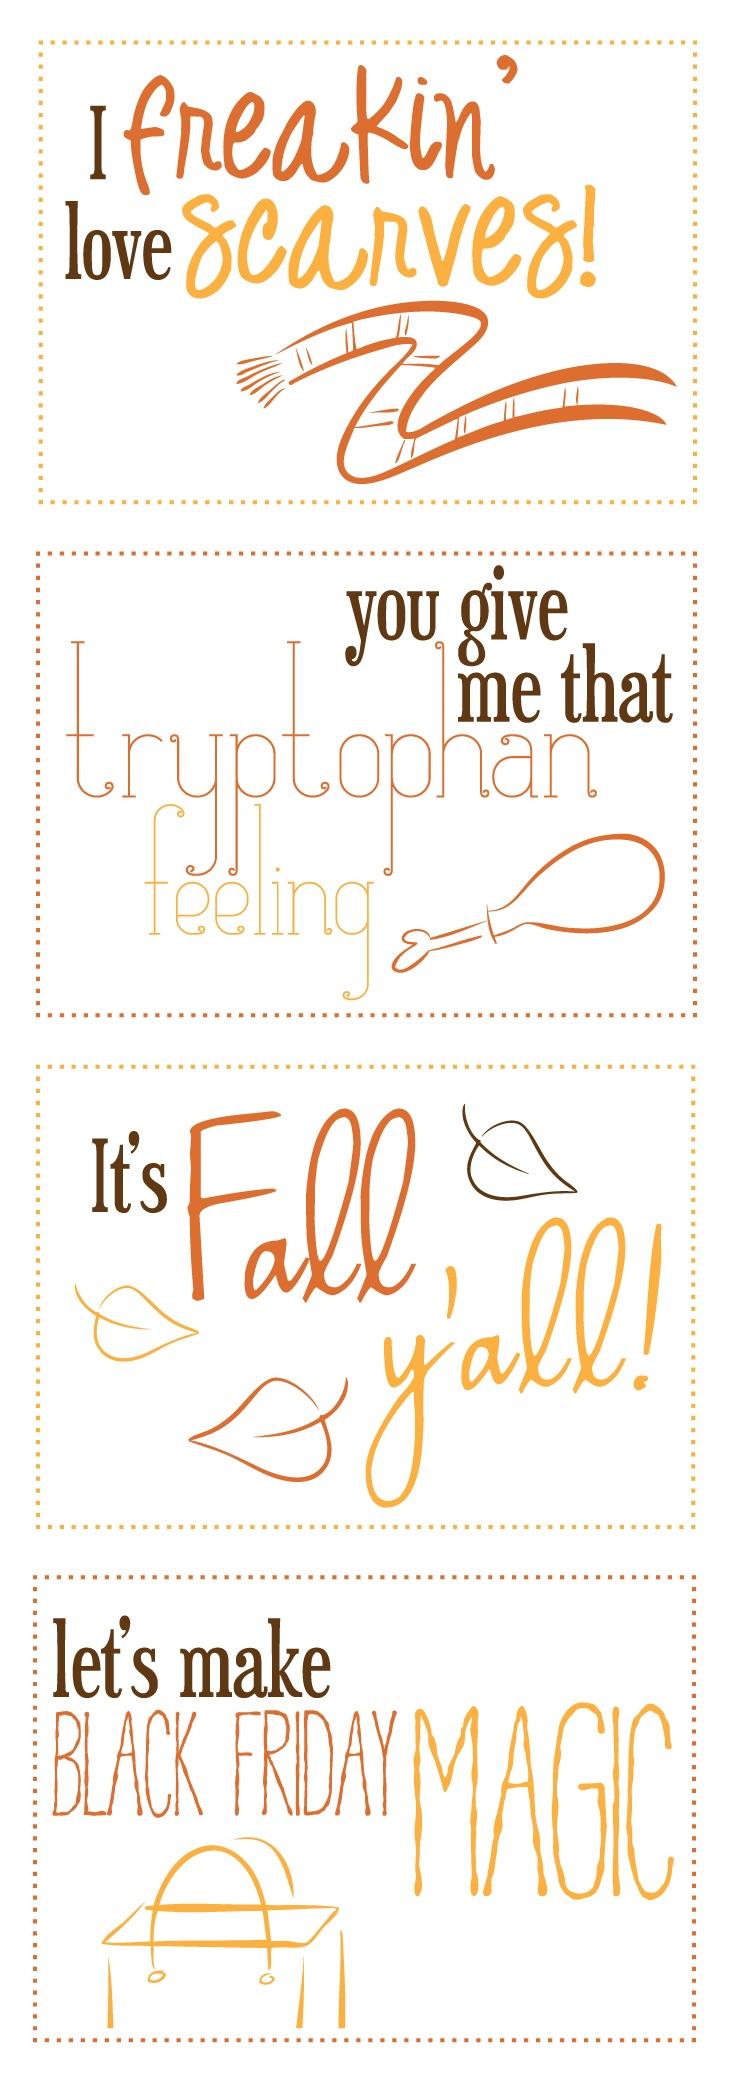 Funny Fall Printables via Let's Eat Grandpa!